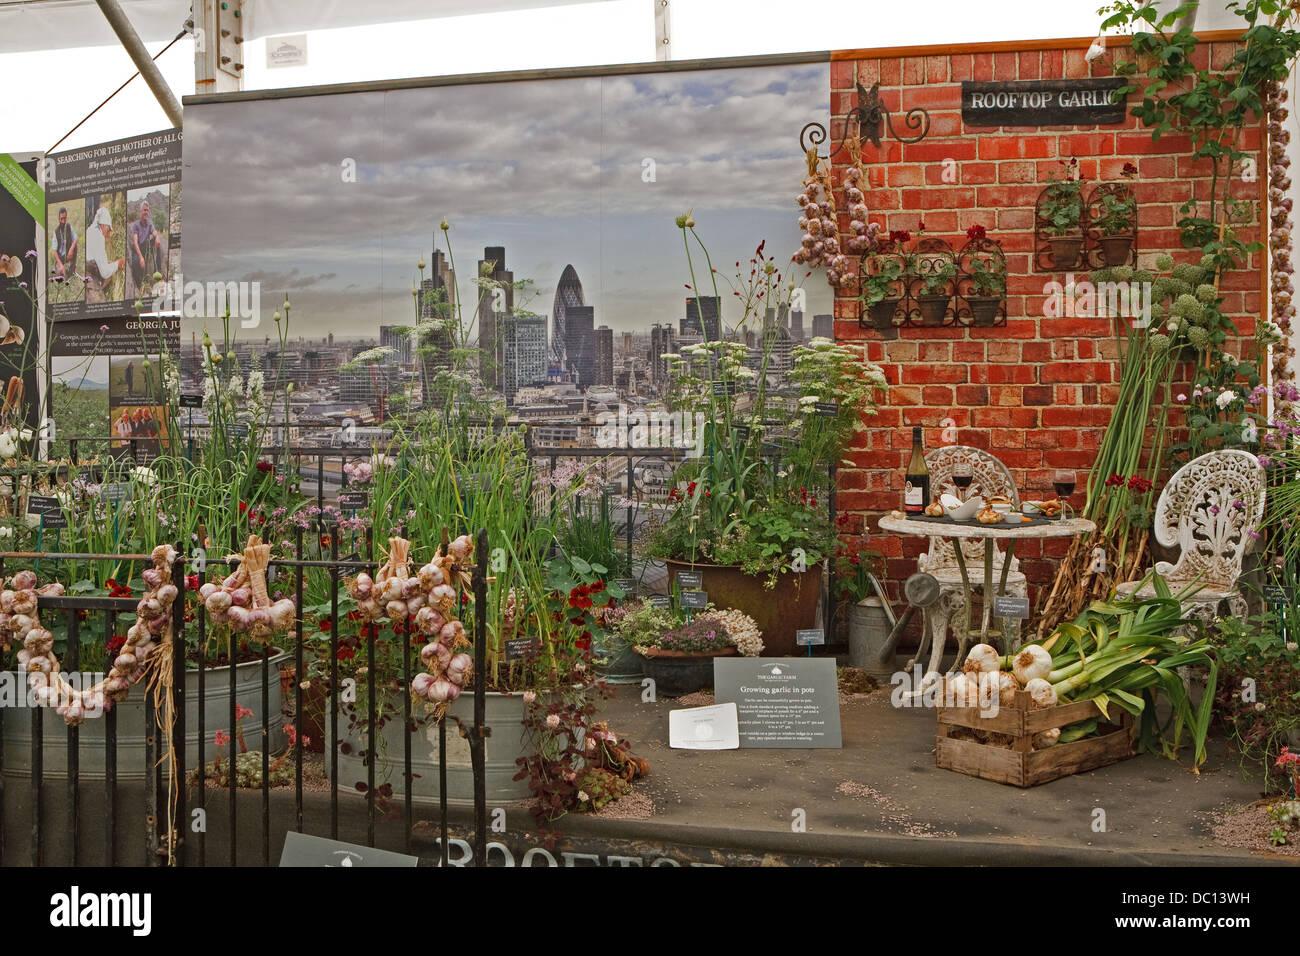 Garden Display Hampton Court Flower Stock Photos & Garden Display ...